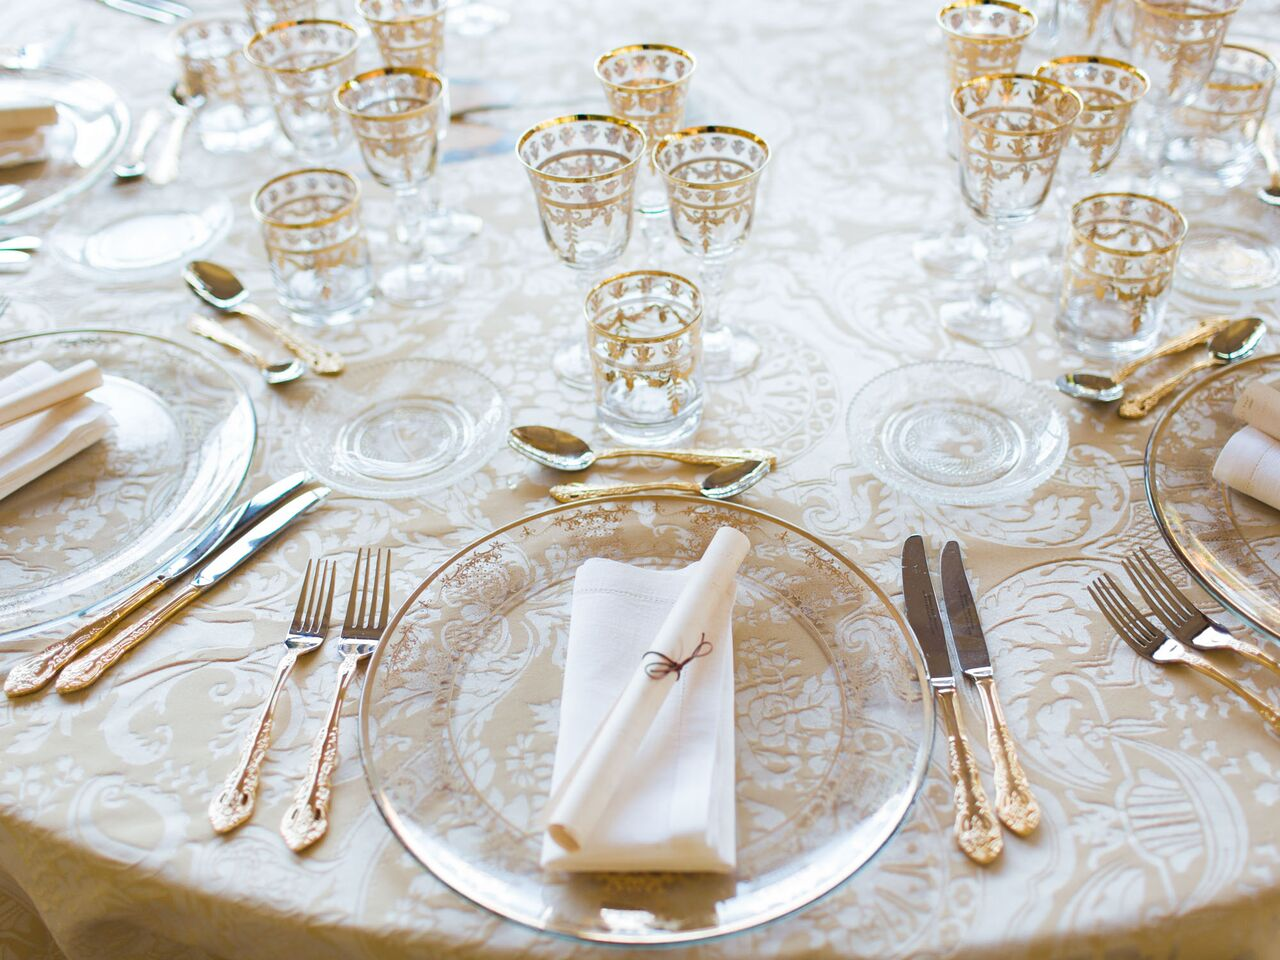 Si-Quiero-Wedding-Planner-By-Sira-Antequera-Paola-Pedro-4